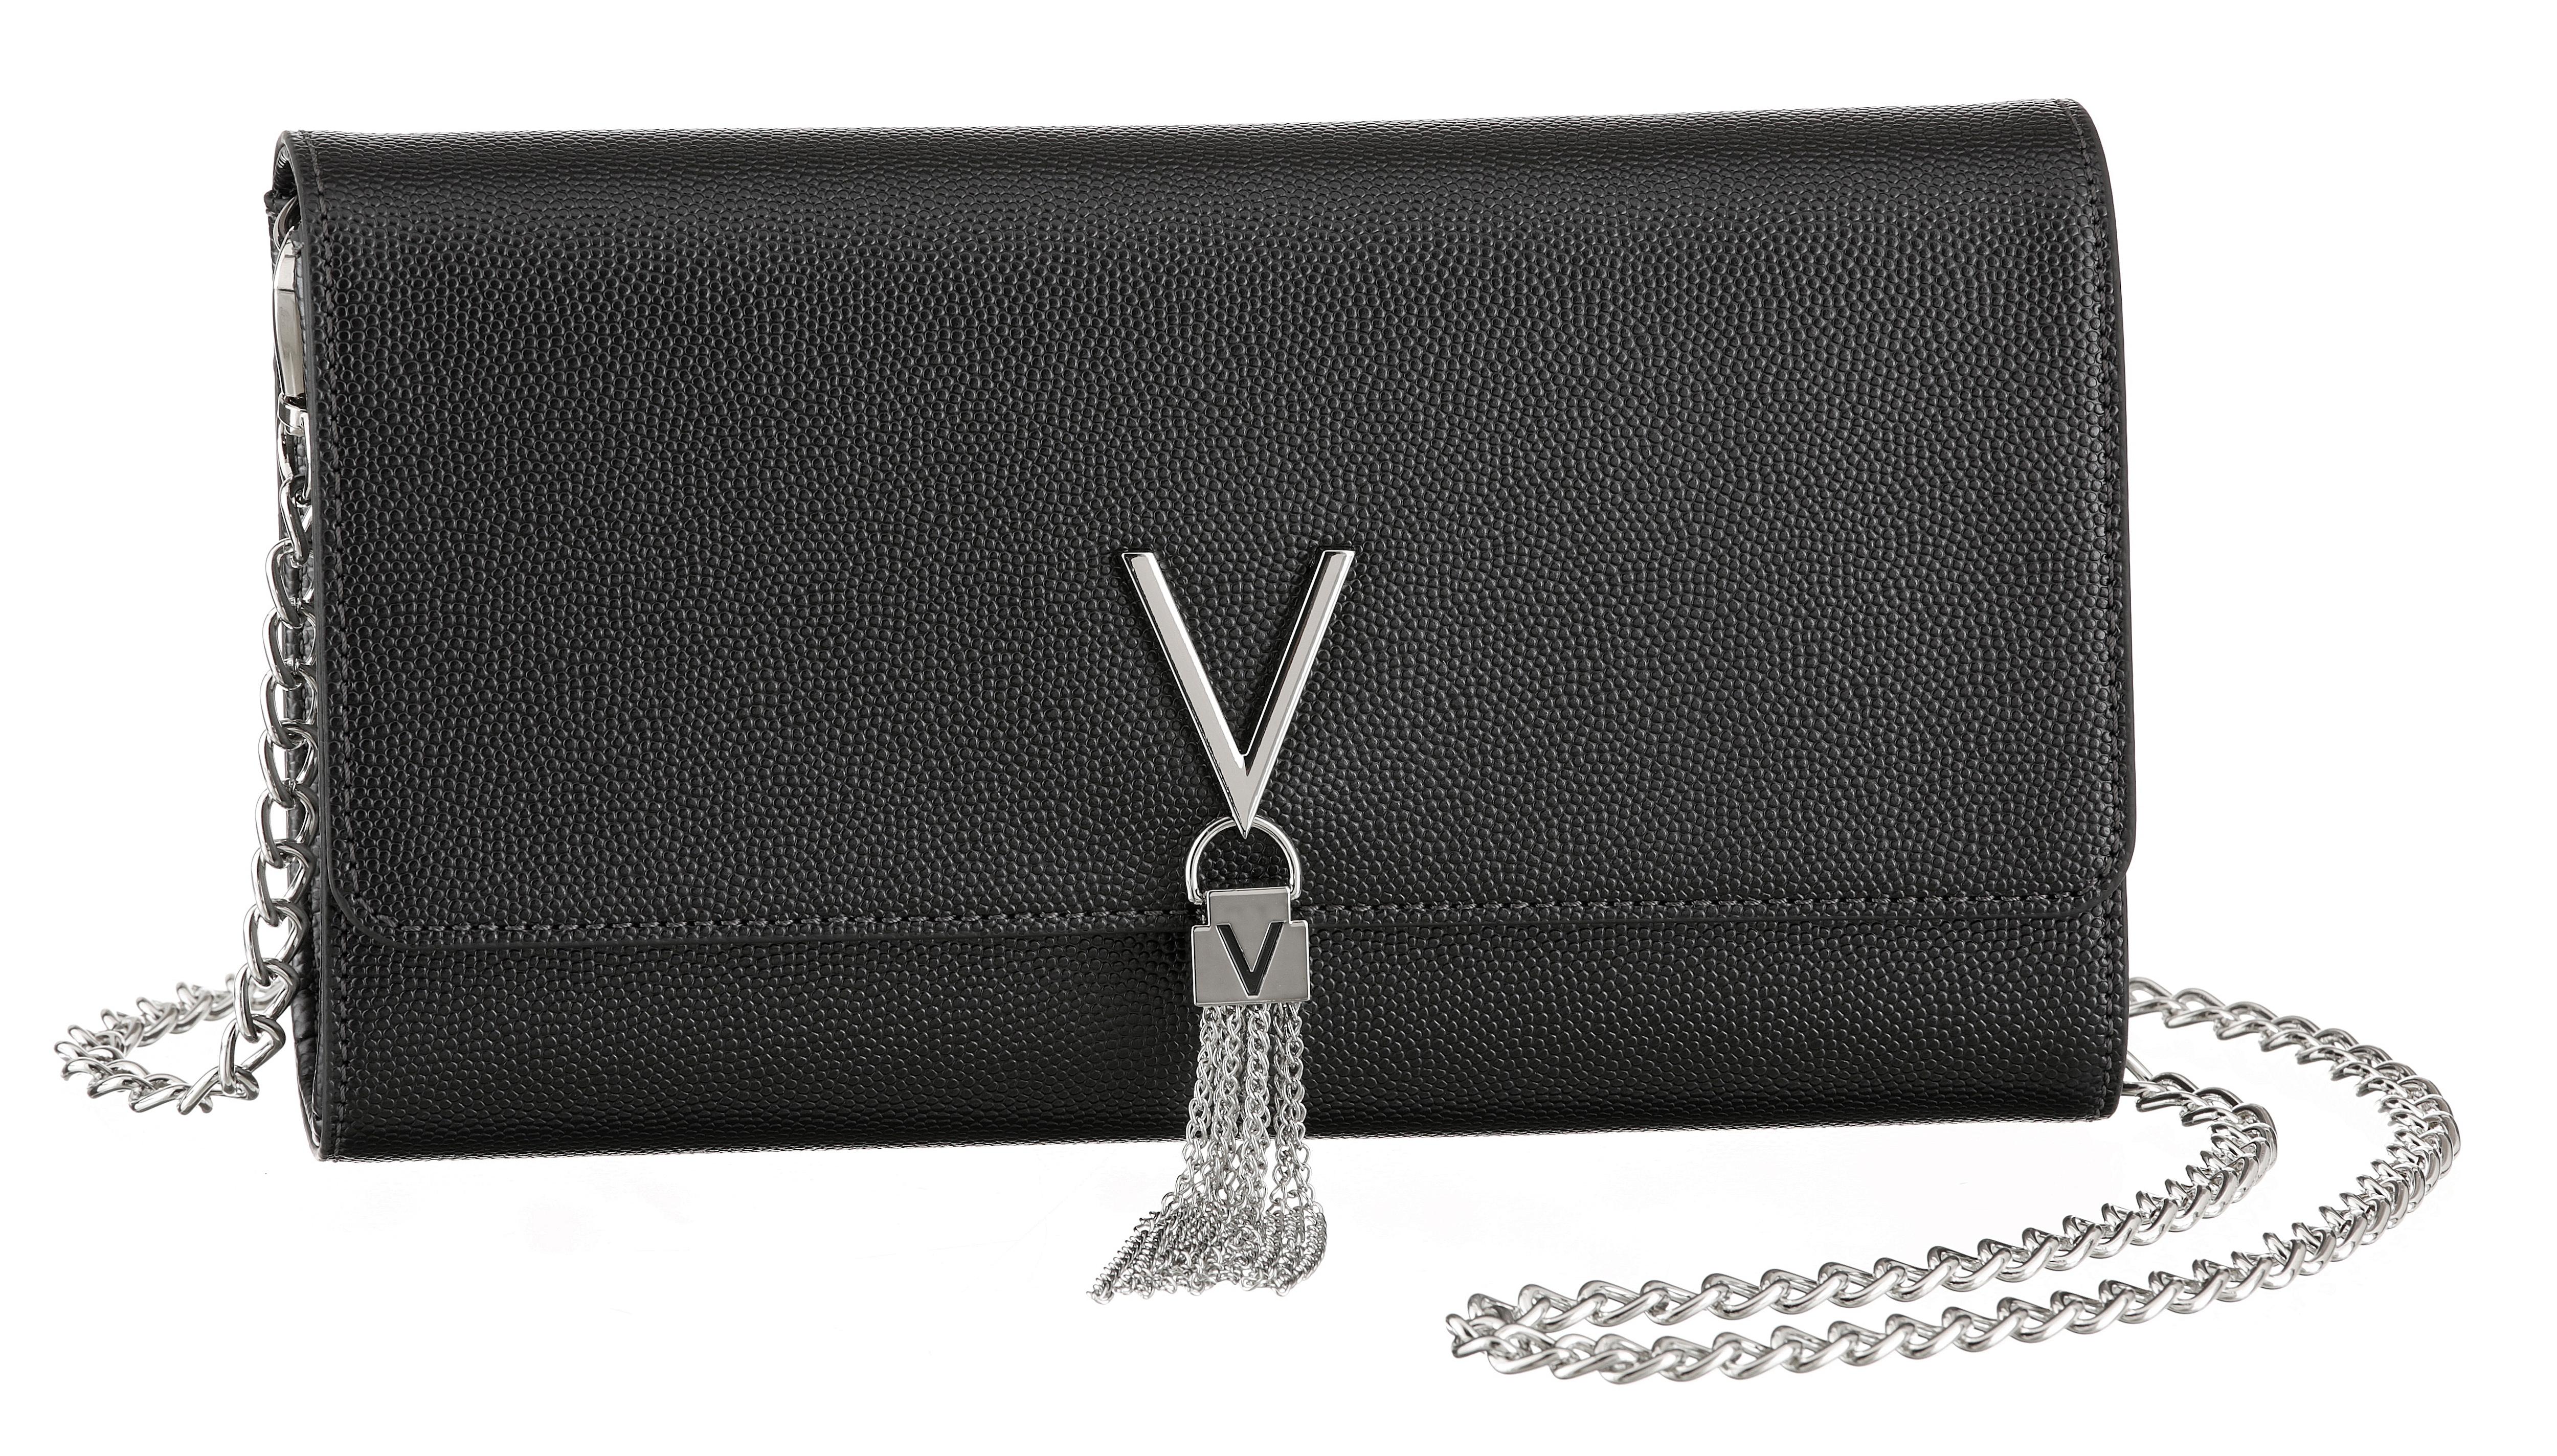 valentino bags -  Clutch Divina, als Clutch oder an der Schulter tragbar